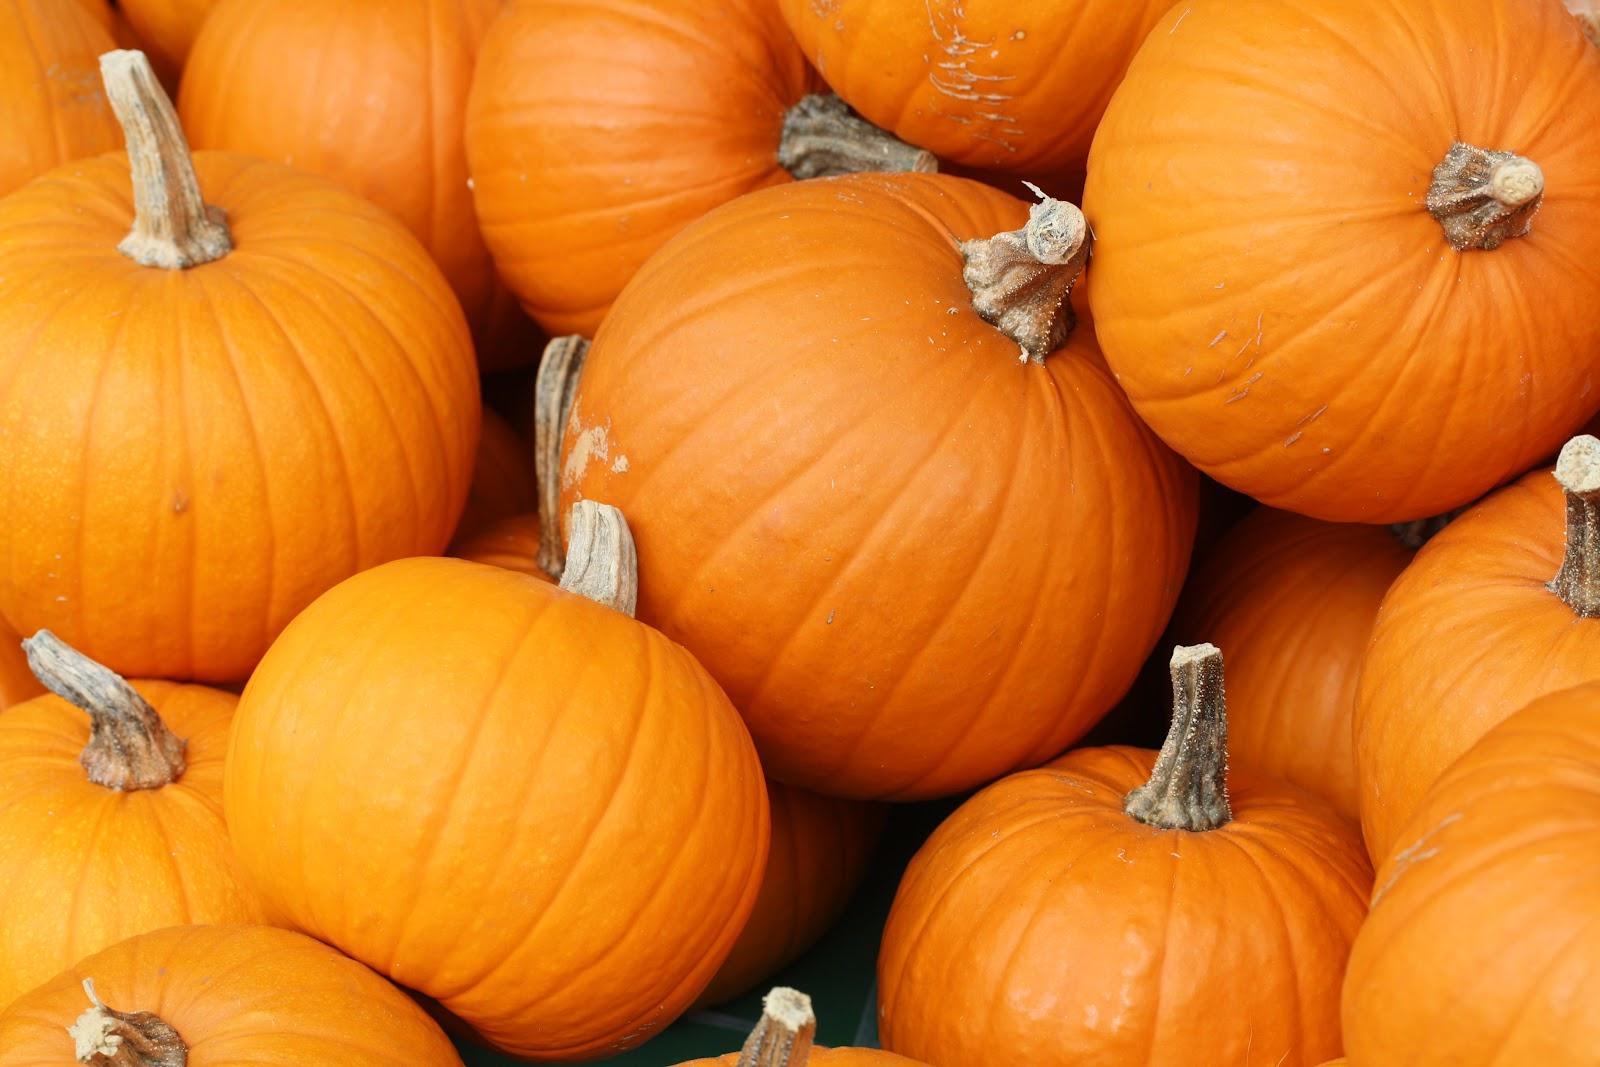 Bake_these_(pumpkins_in_Toronto).jpg